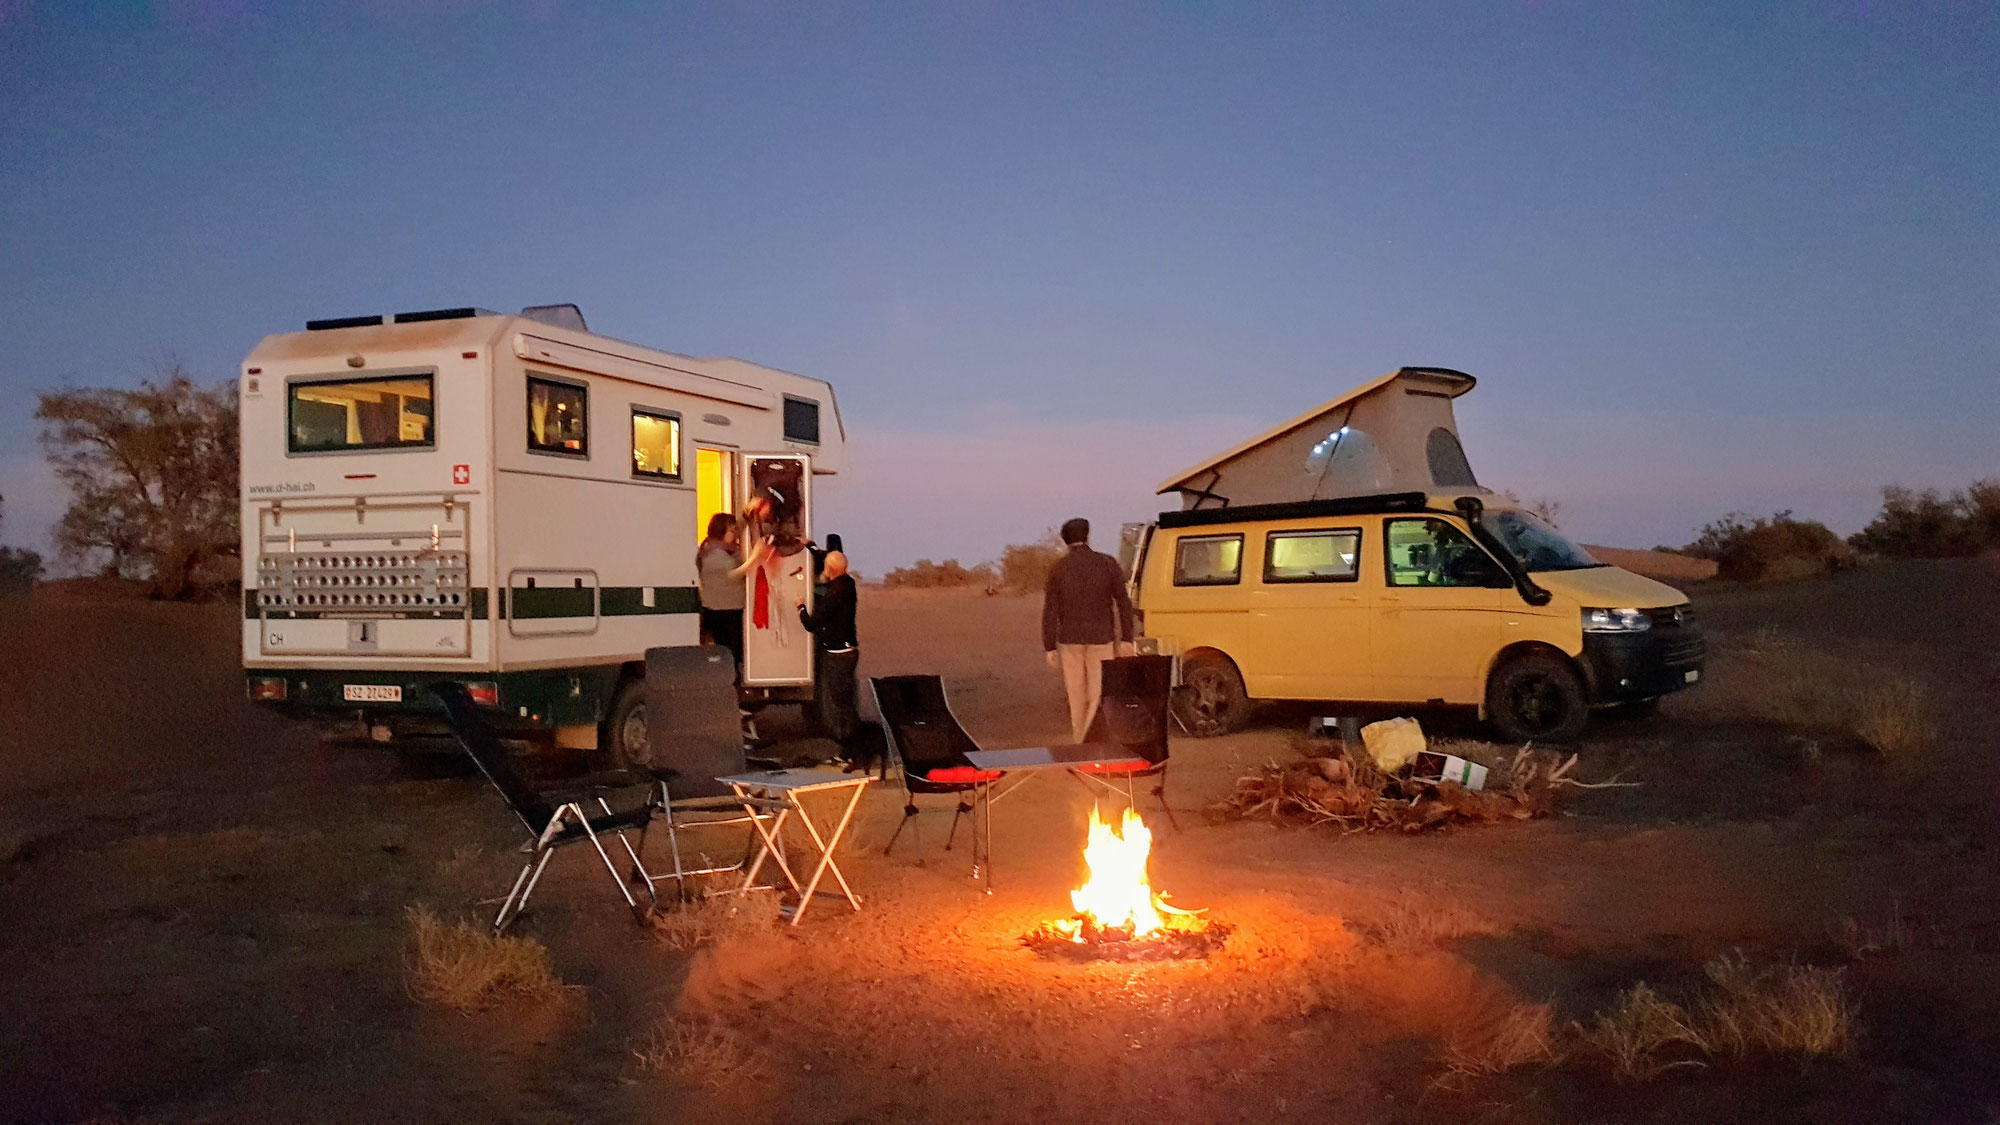 Overland Marokko - Mit dem VW Bus nach Marokko